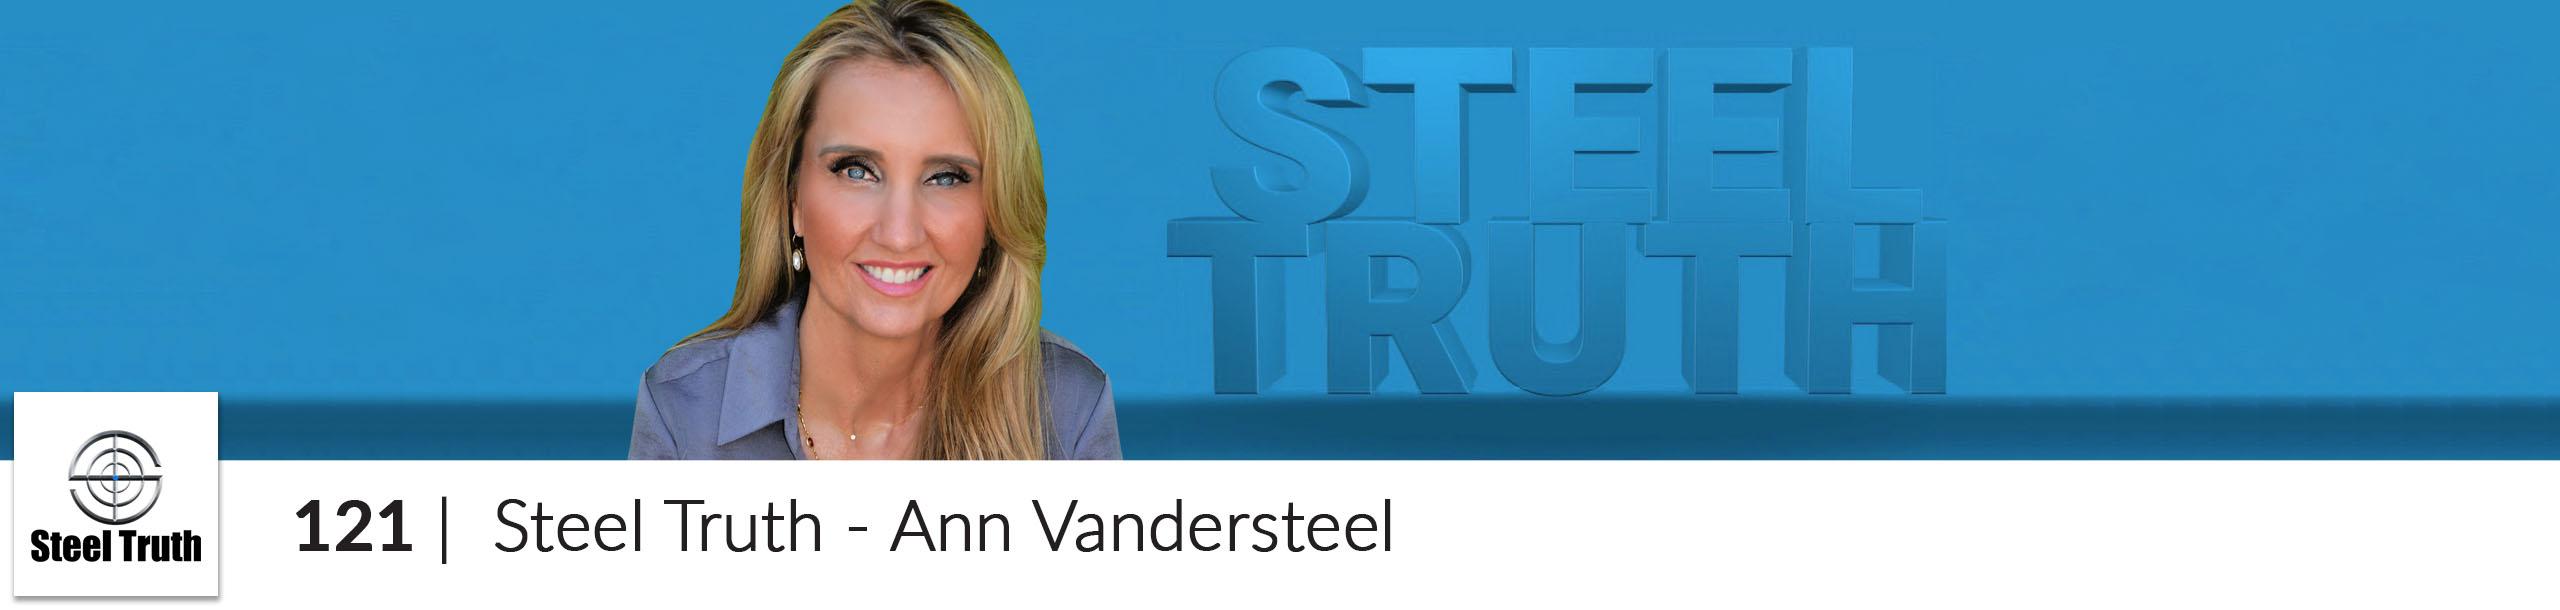 SteelTruth-header01